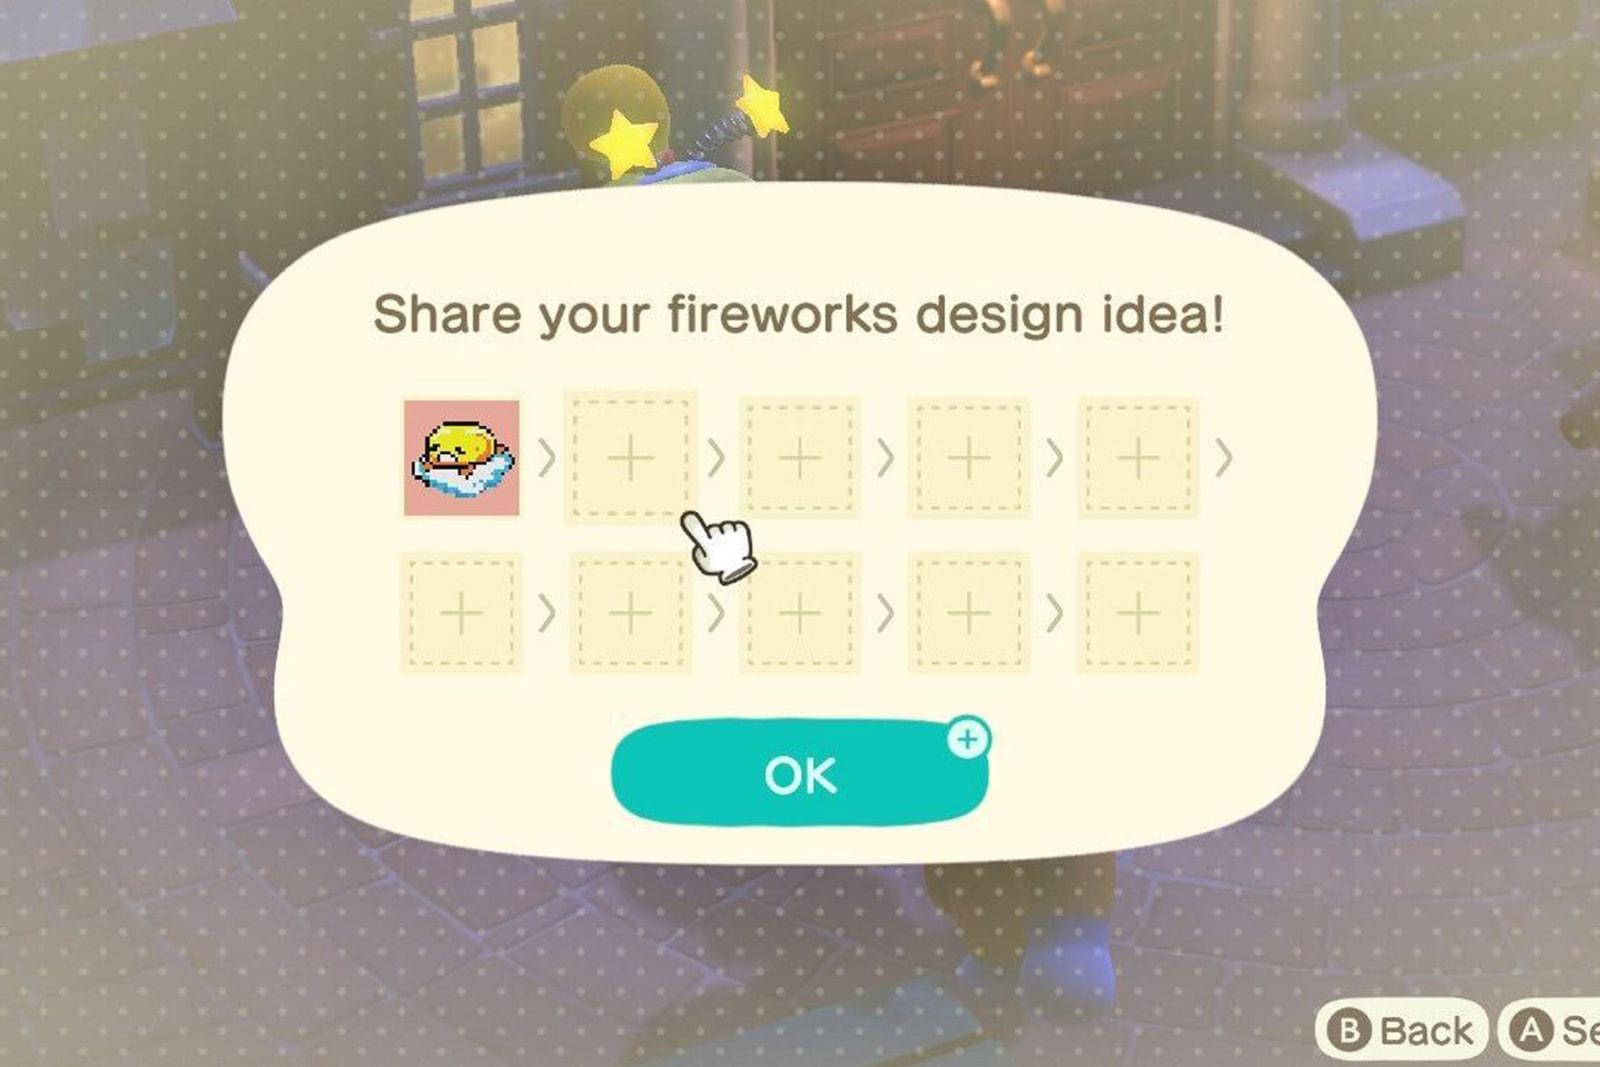 nintendo animal crossing update fireworks sunday night customization gudetama